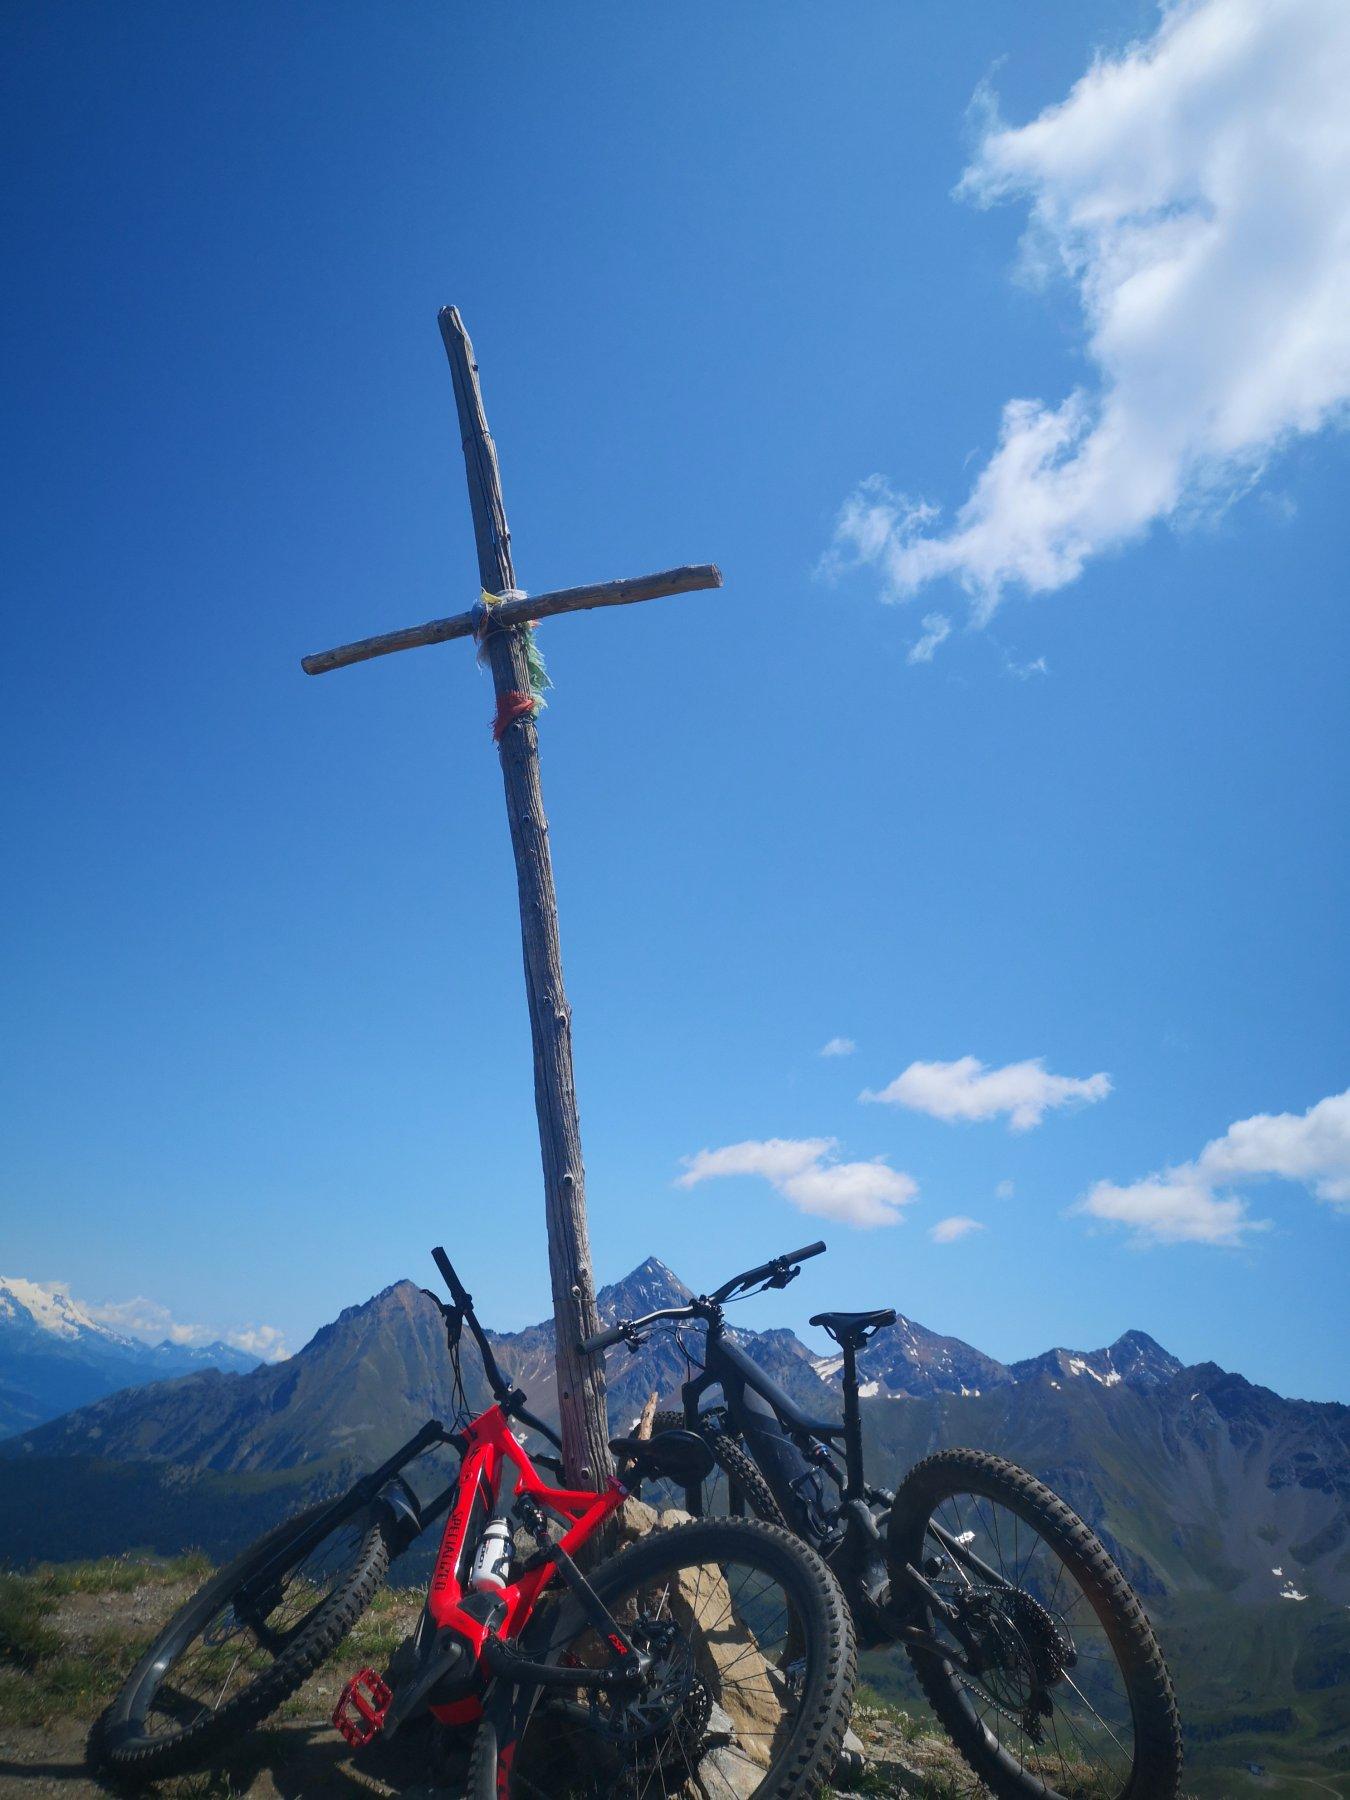 Croce in legno Pointe de la pierre